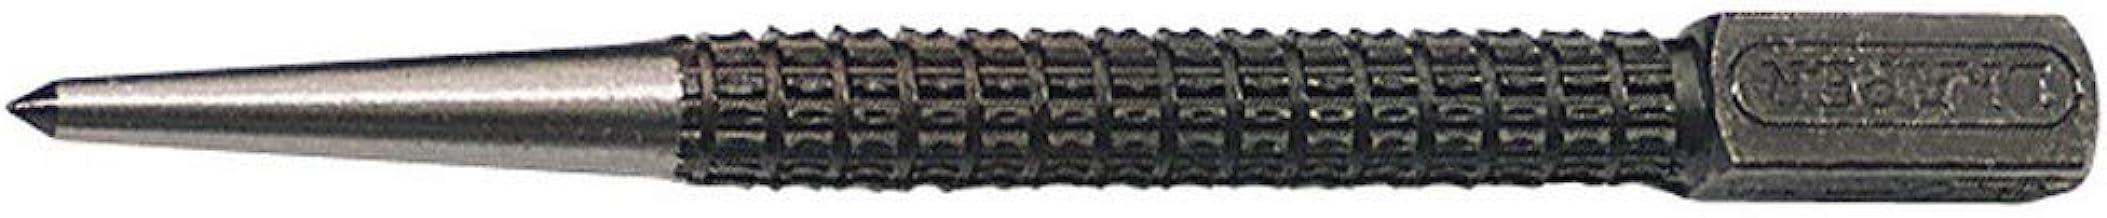 Draper 84464 100 mm mittpunch, 3 mm spetsdiameter